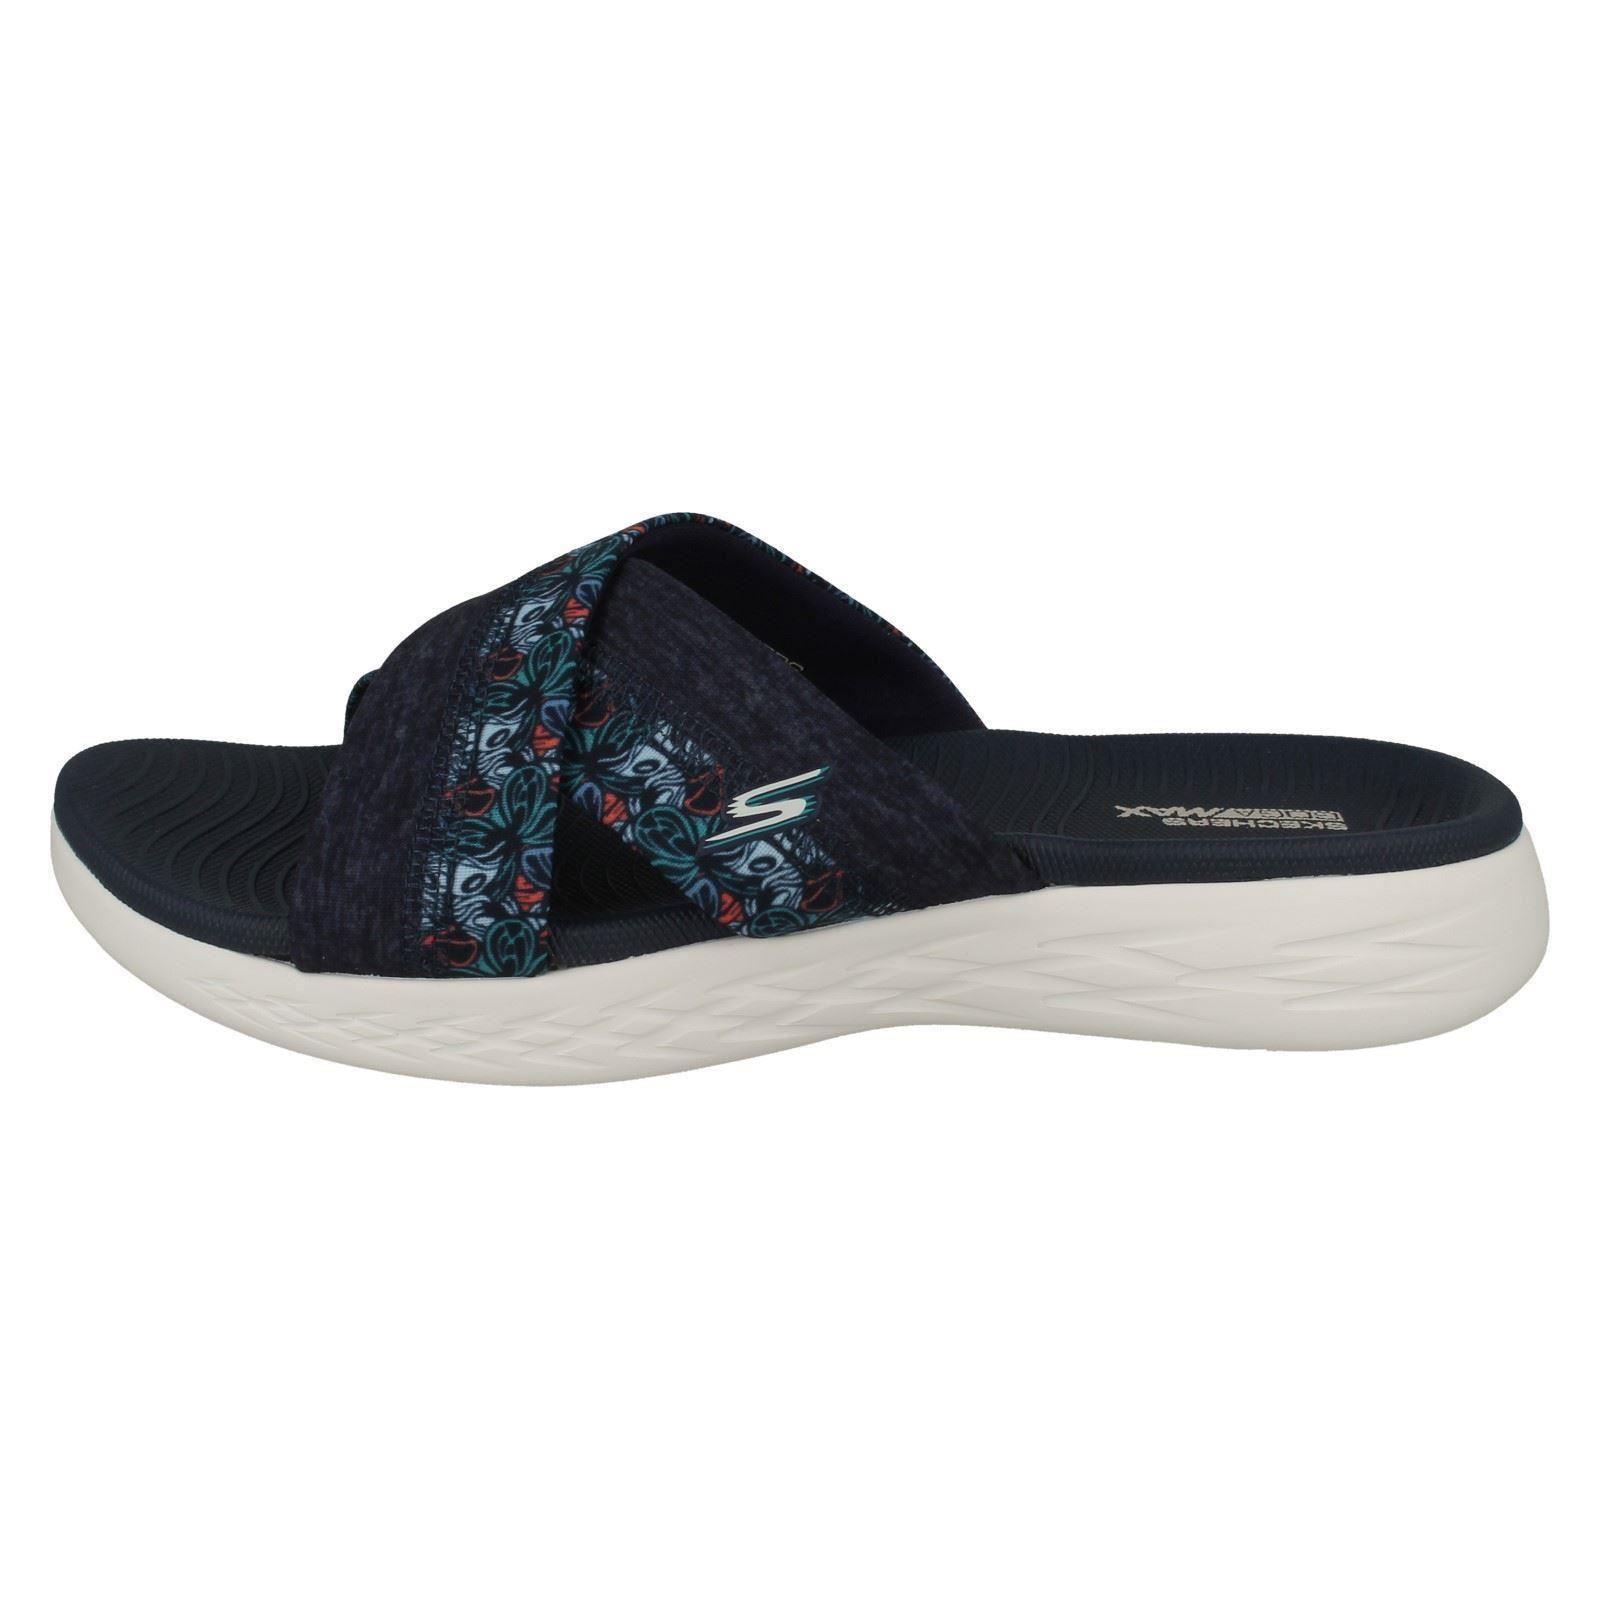 Mule Sandales Skechers bleu 'monarque On Femme Marine 15306' Slip naIFSTR